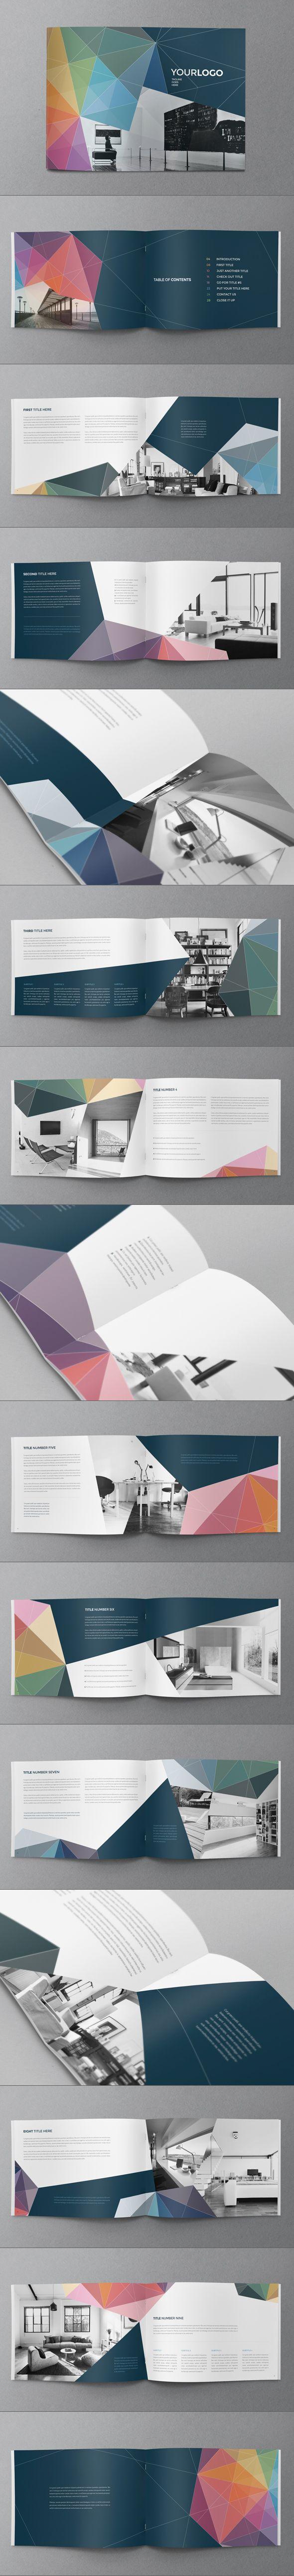 Multicolor Modern Brochure. Download here: http://graphicriver.net/item/multicolor-modern-brochure/7436397?ref=abradesign #design #brochure